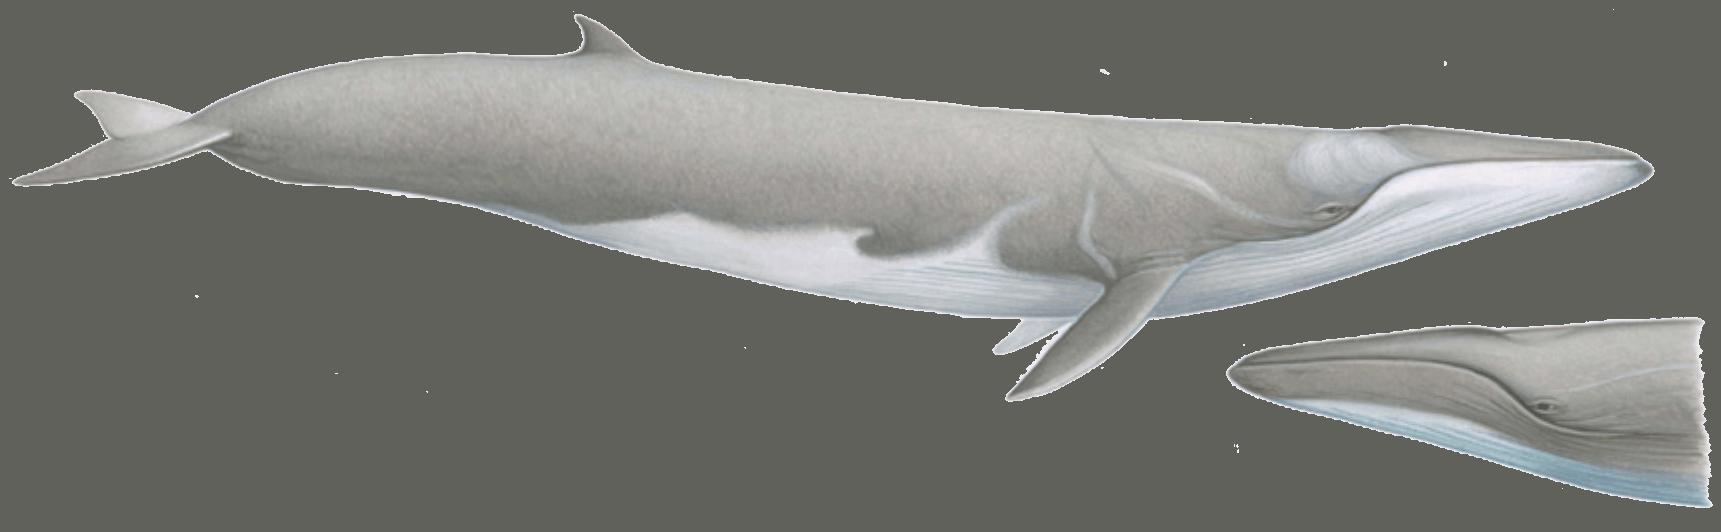 Fin whale illsustration